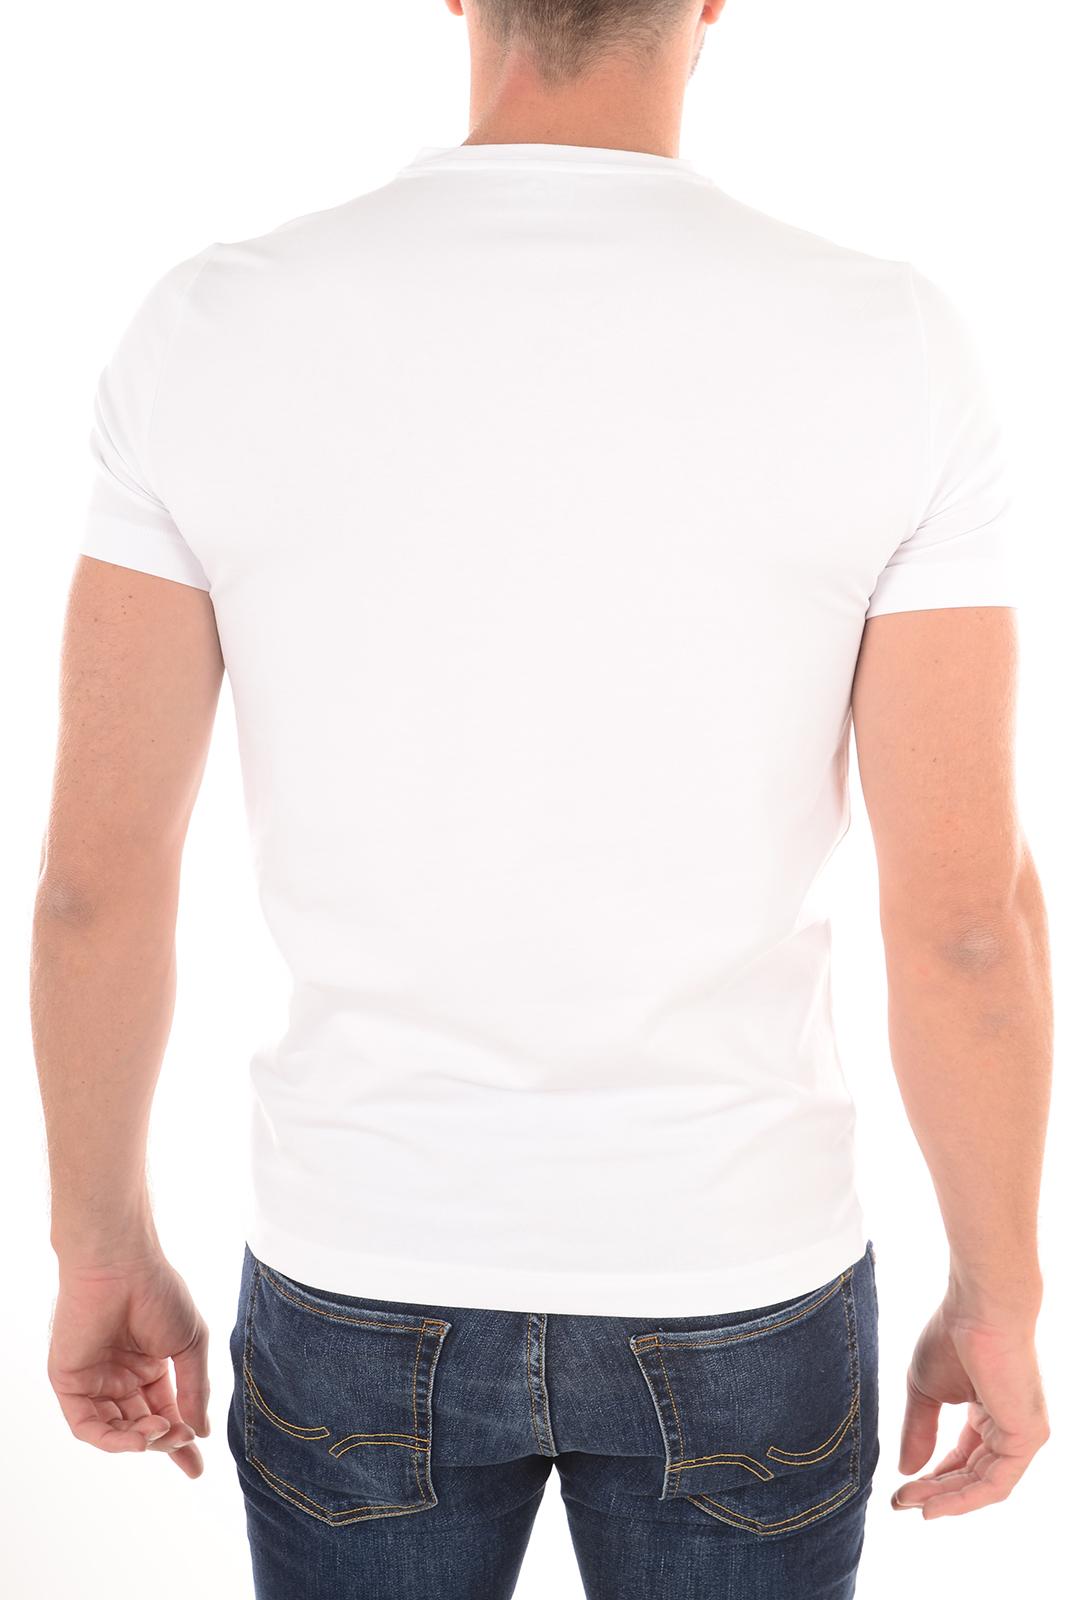 Tee-shirts  Emporio armani 273911 6P206 010 BLANC